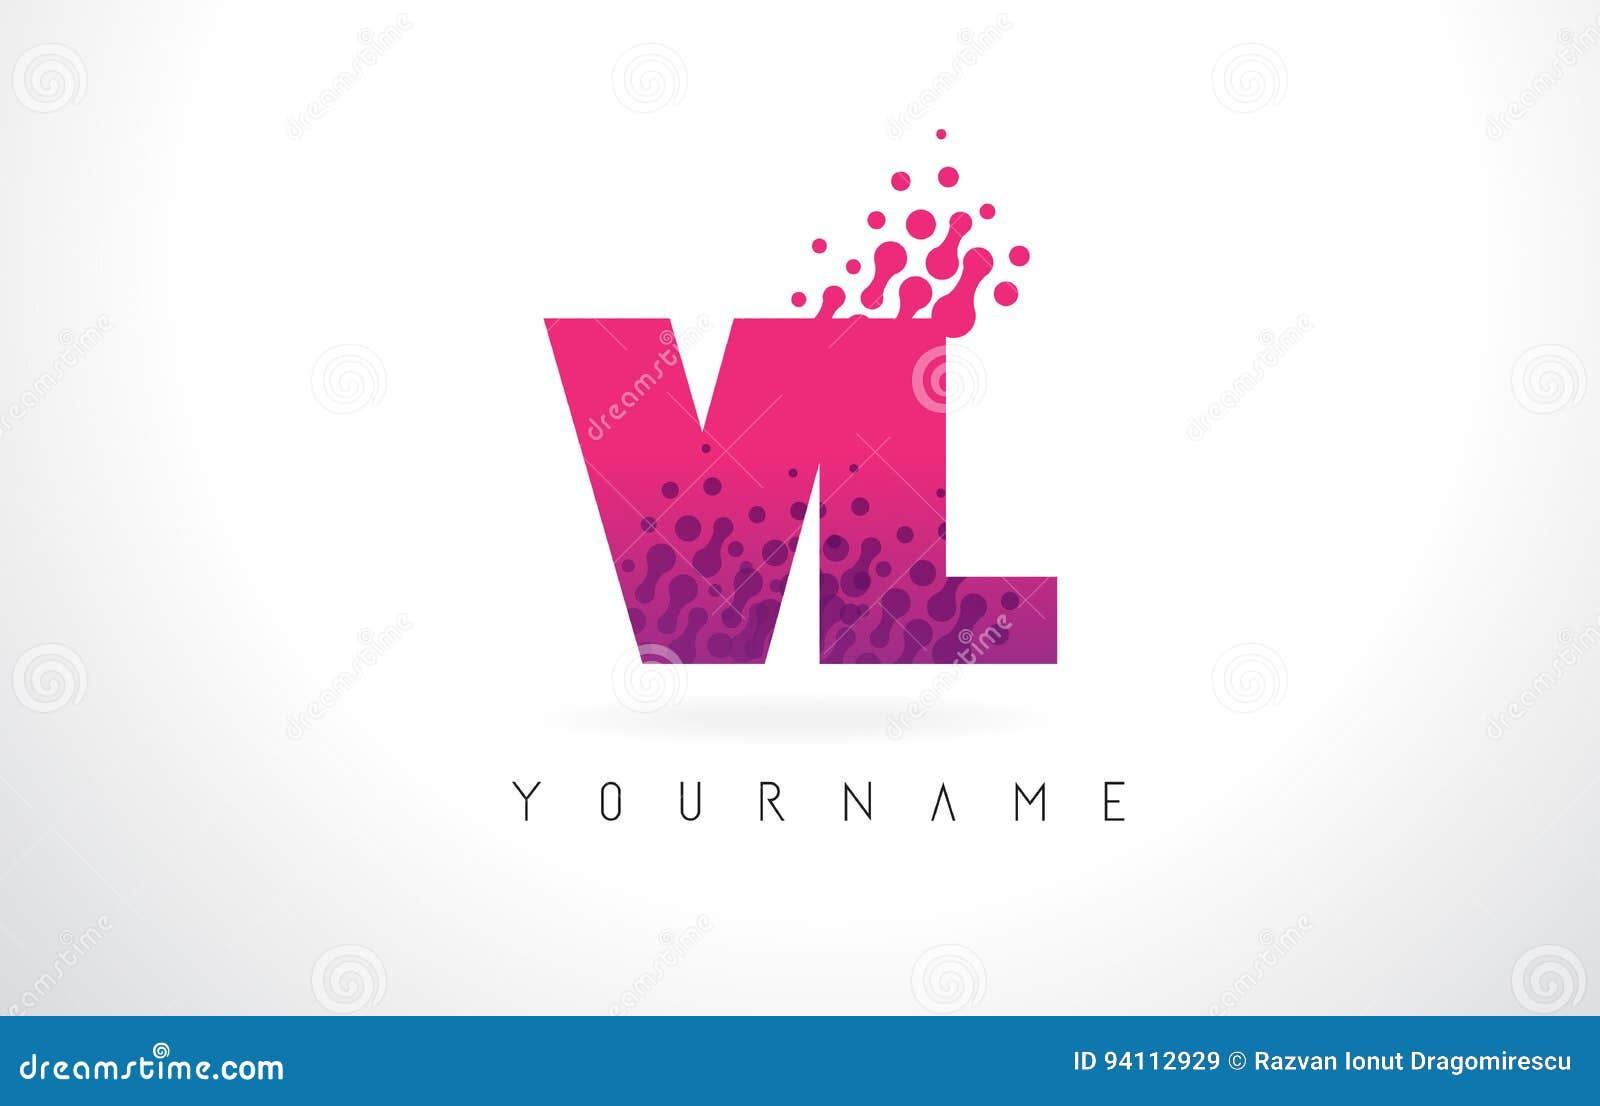 Vl V L Letter Logo With Pink Purple Color And Particles Dots Design